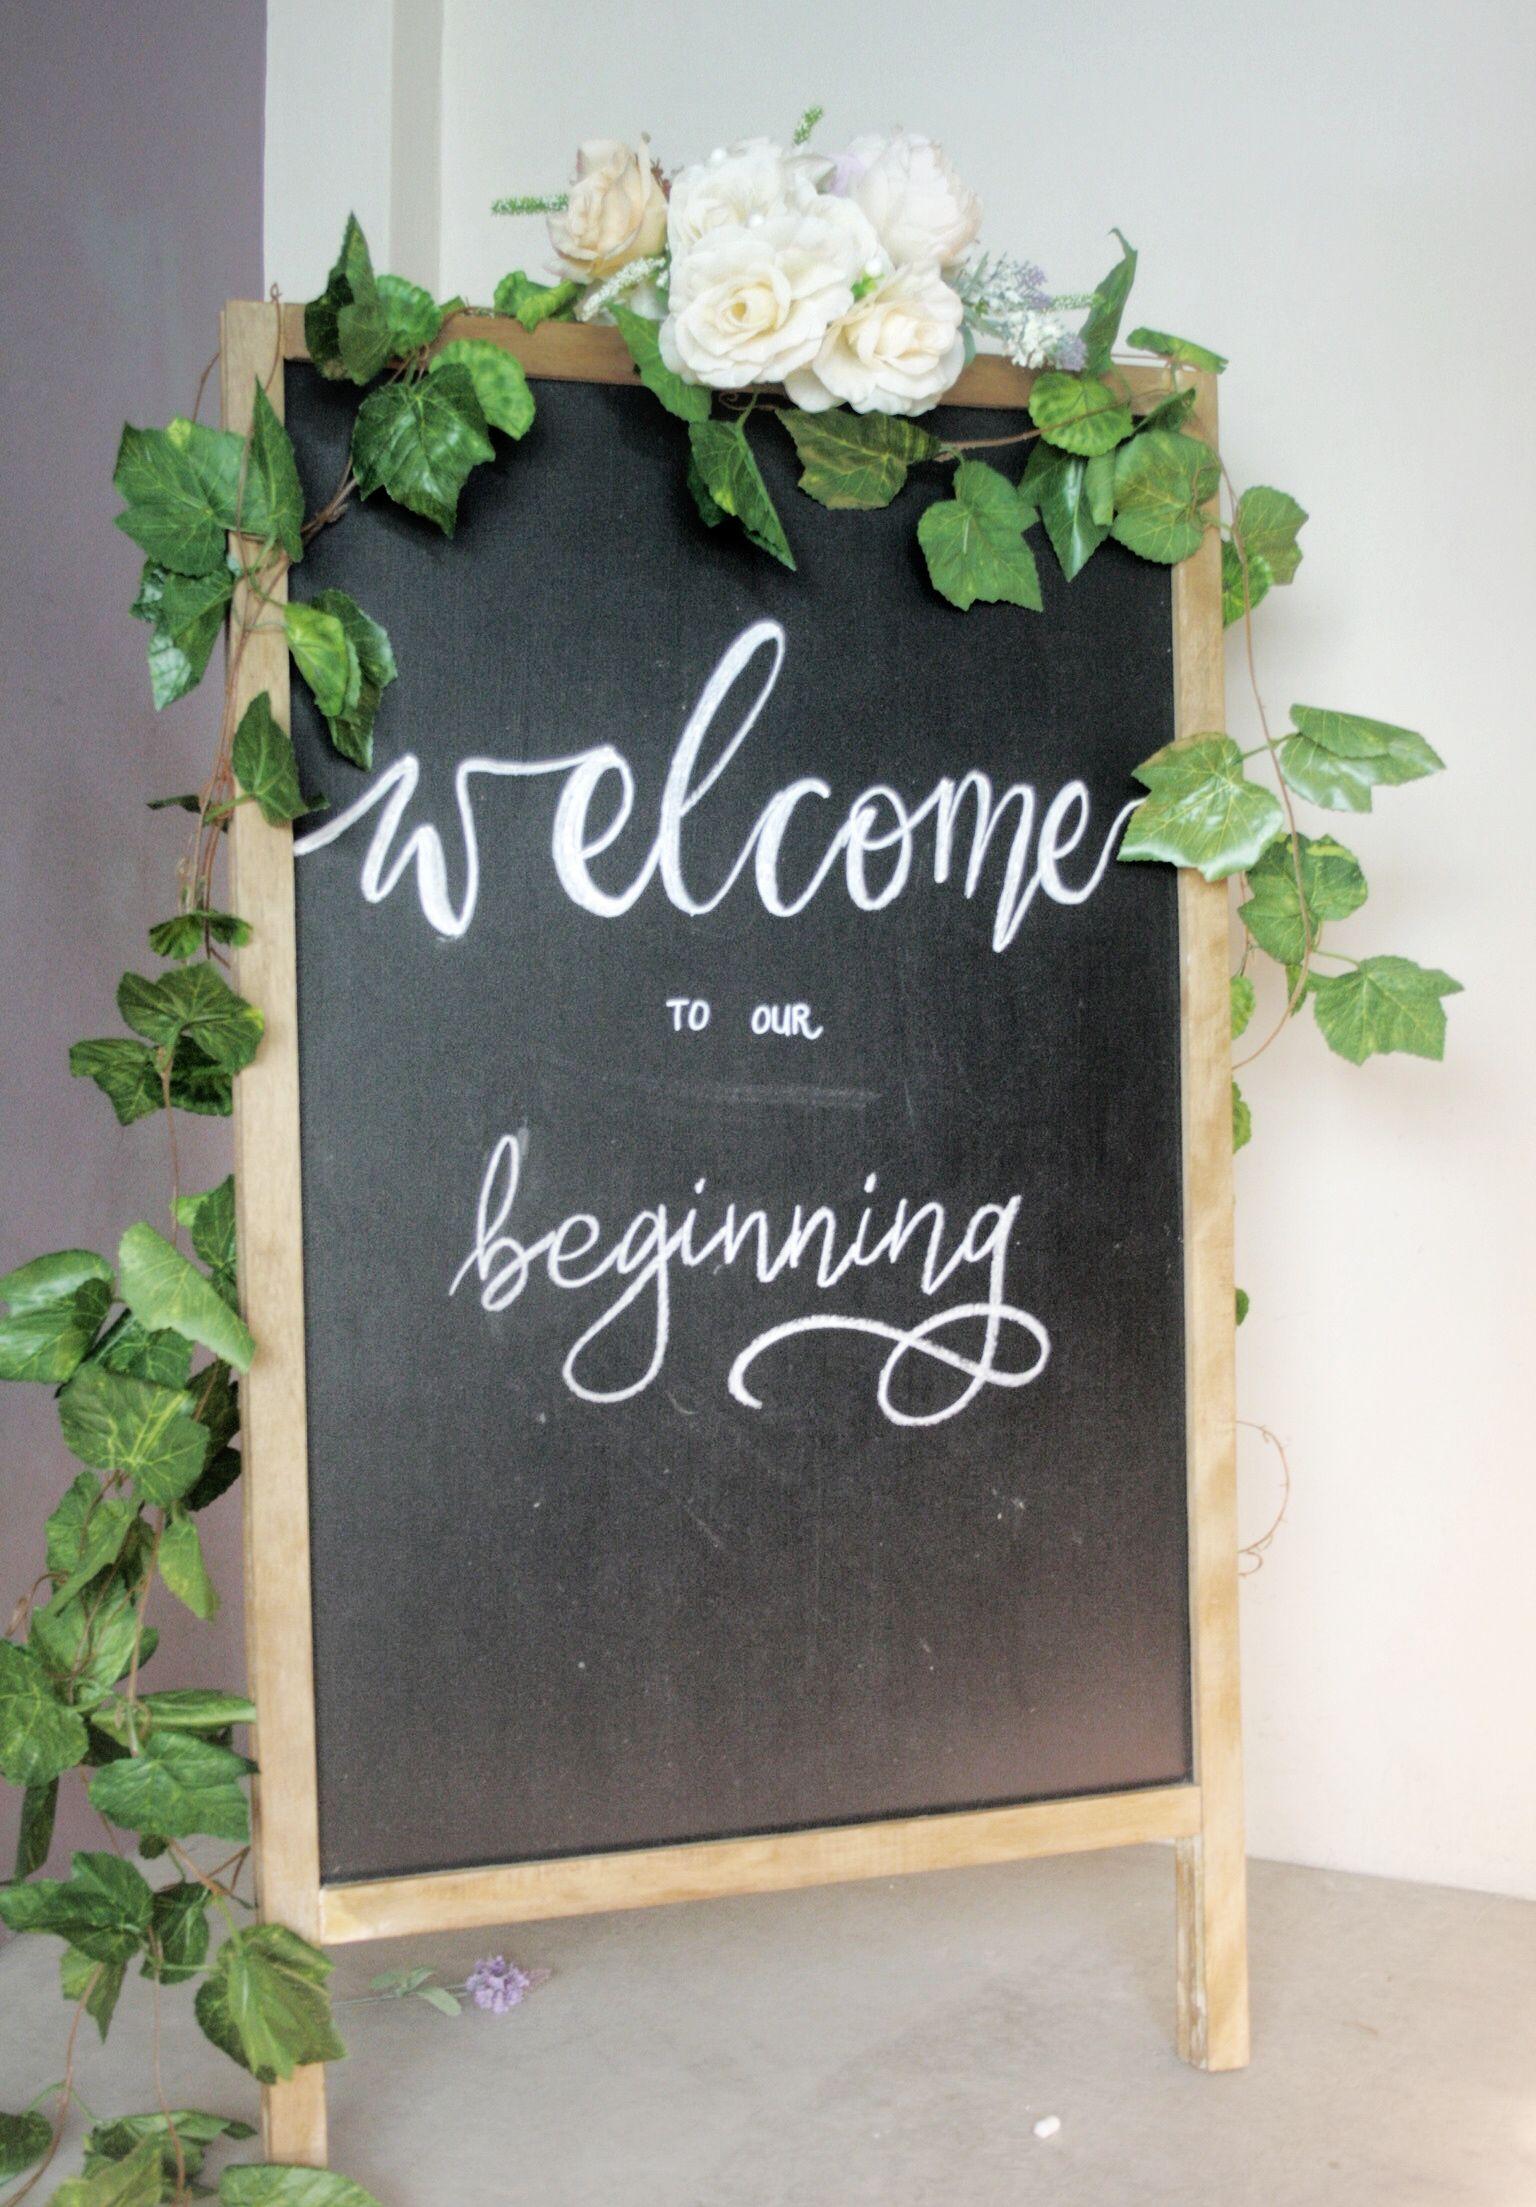 Chalkboard Lettering For Wedding Welcome Board